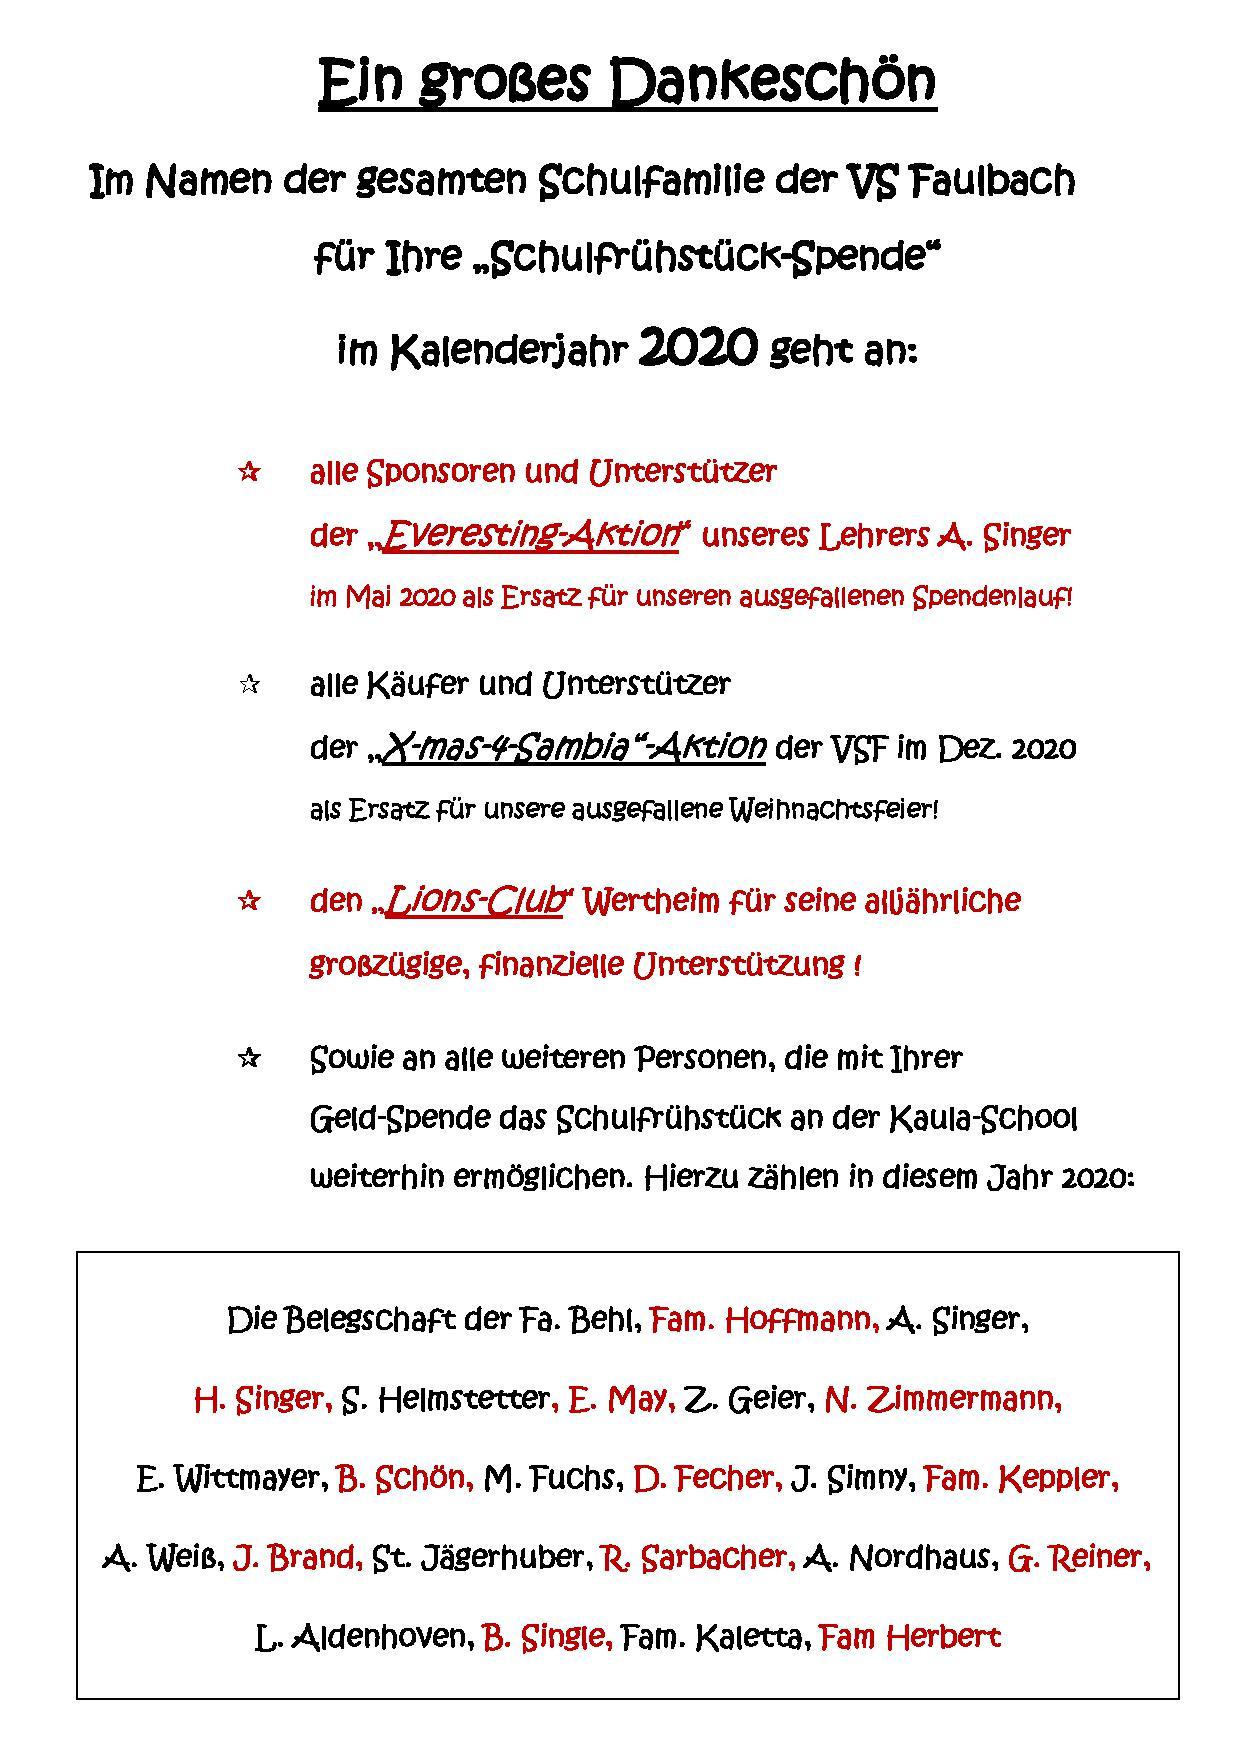 DANKESCHÖN_2020_-_homepage_an_SCHULFRÜHSTÜCK_-_SAMBIA_II_pdf-2.jpg